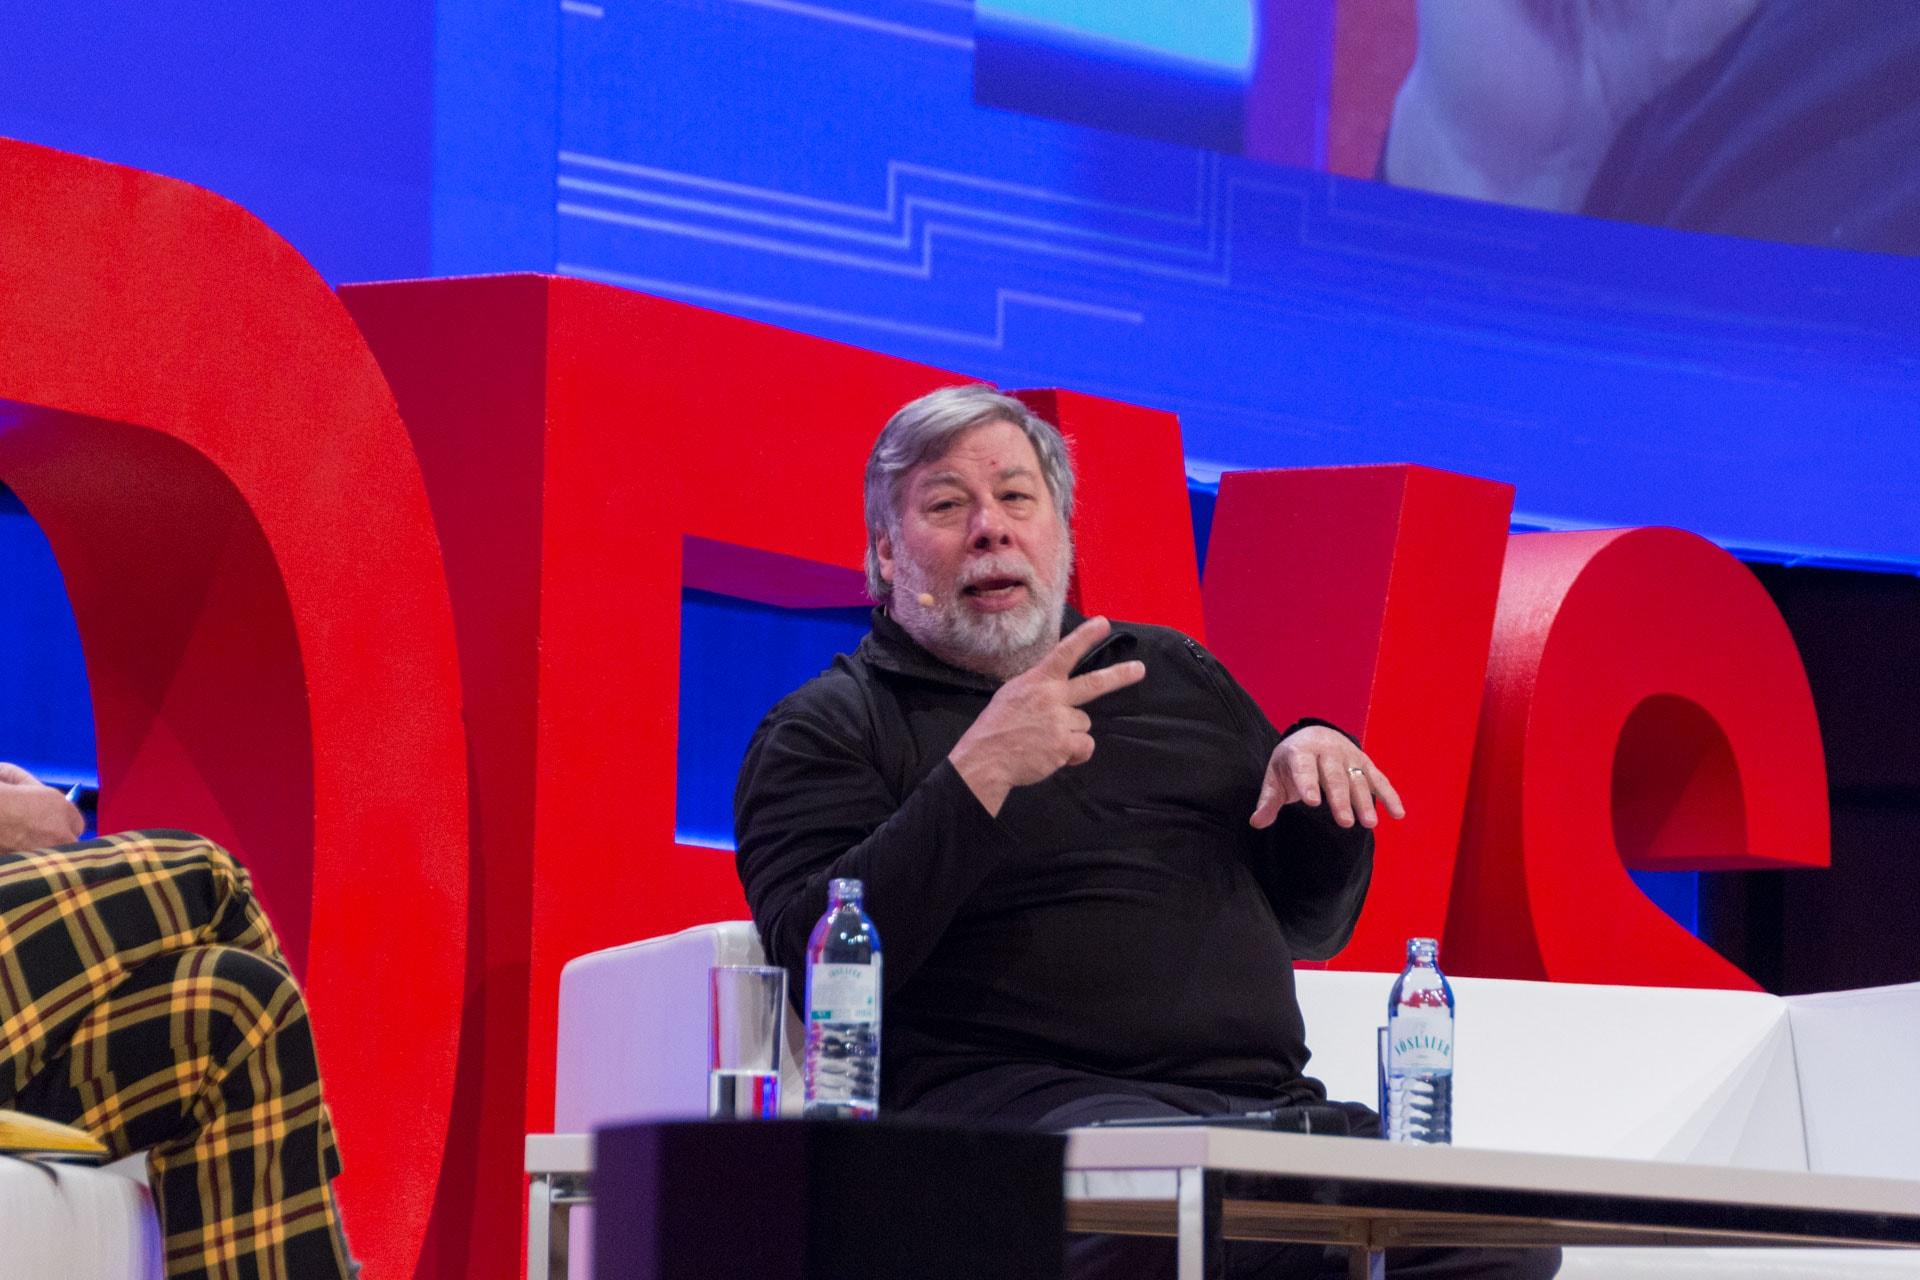 Steve Wozniak bei WeAreDevelopers im Fireside Chat mit Monty Munford